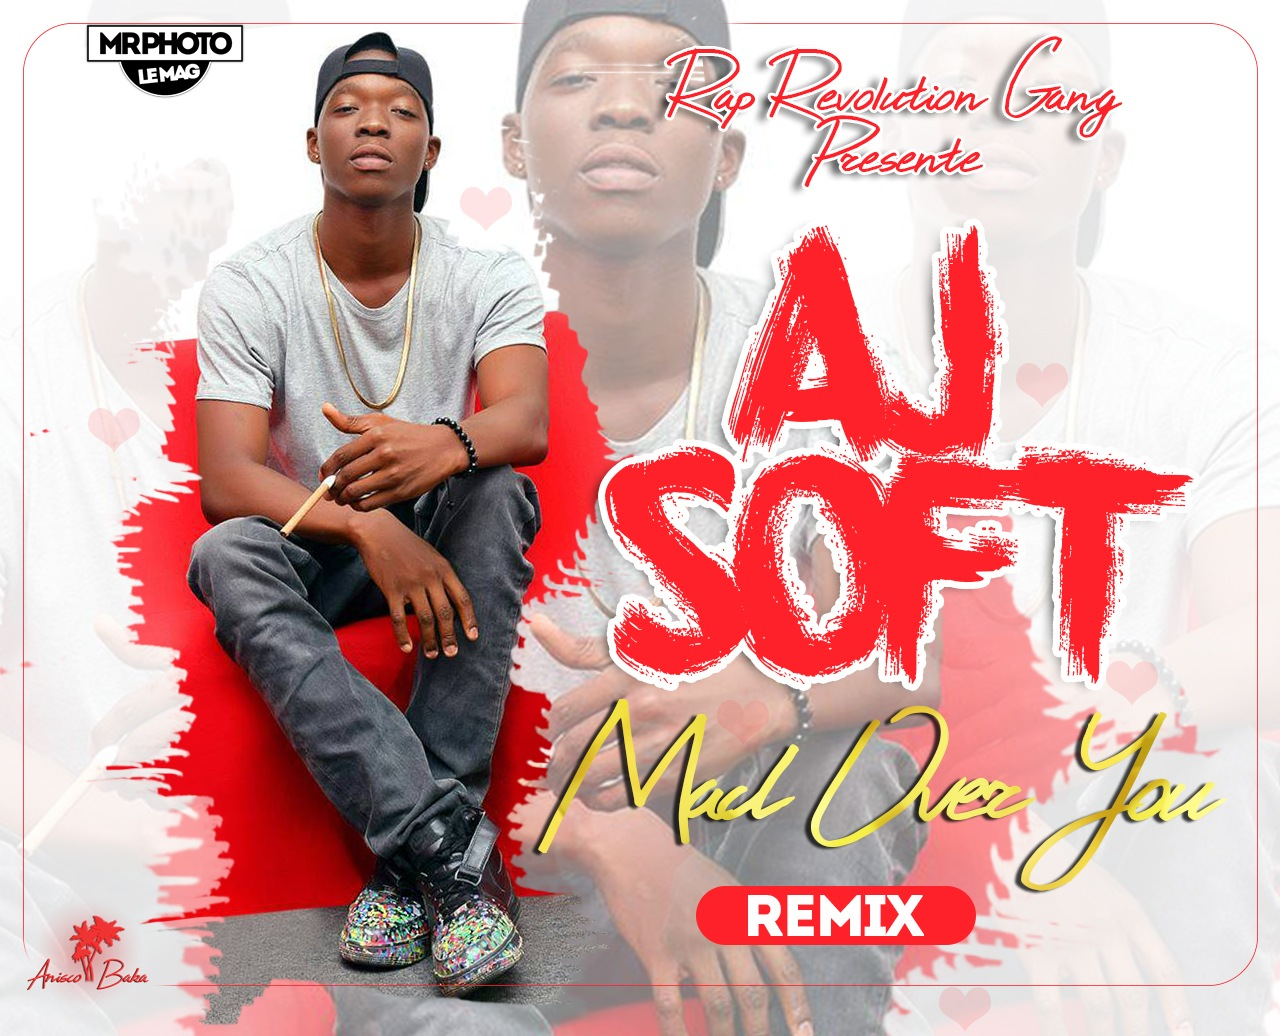 AJ SOFT - MAD OVER YOU (remix) by Anisco Baka